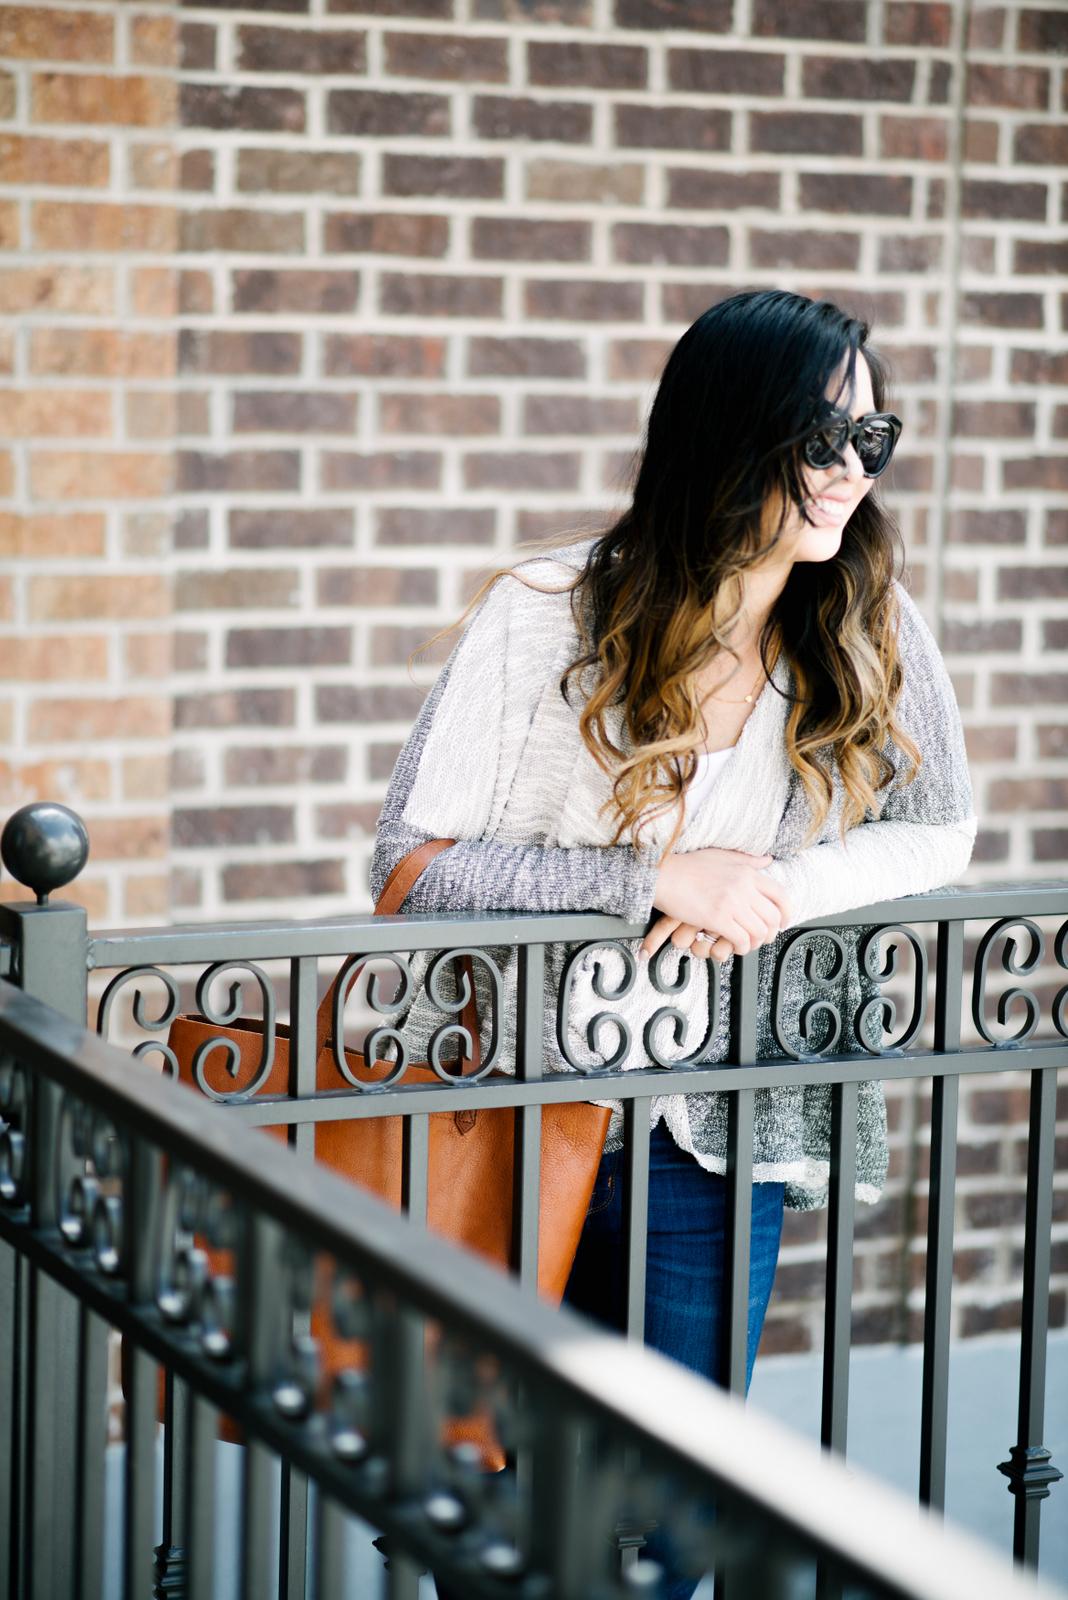 Become a stylist with La Senorita Jolie